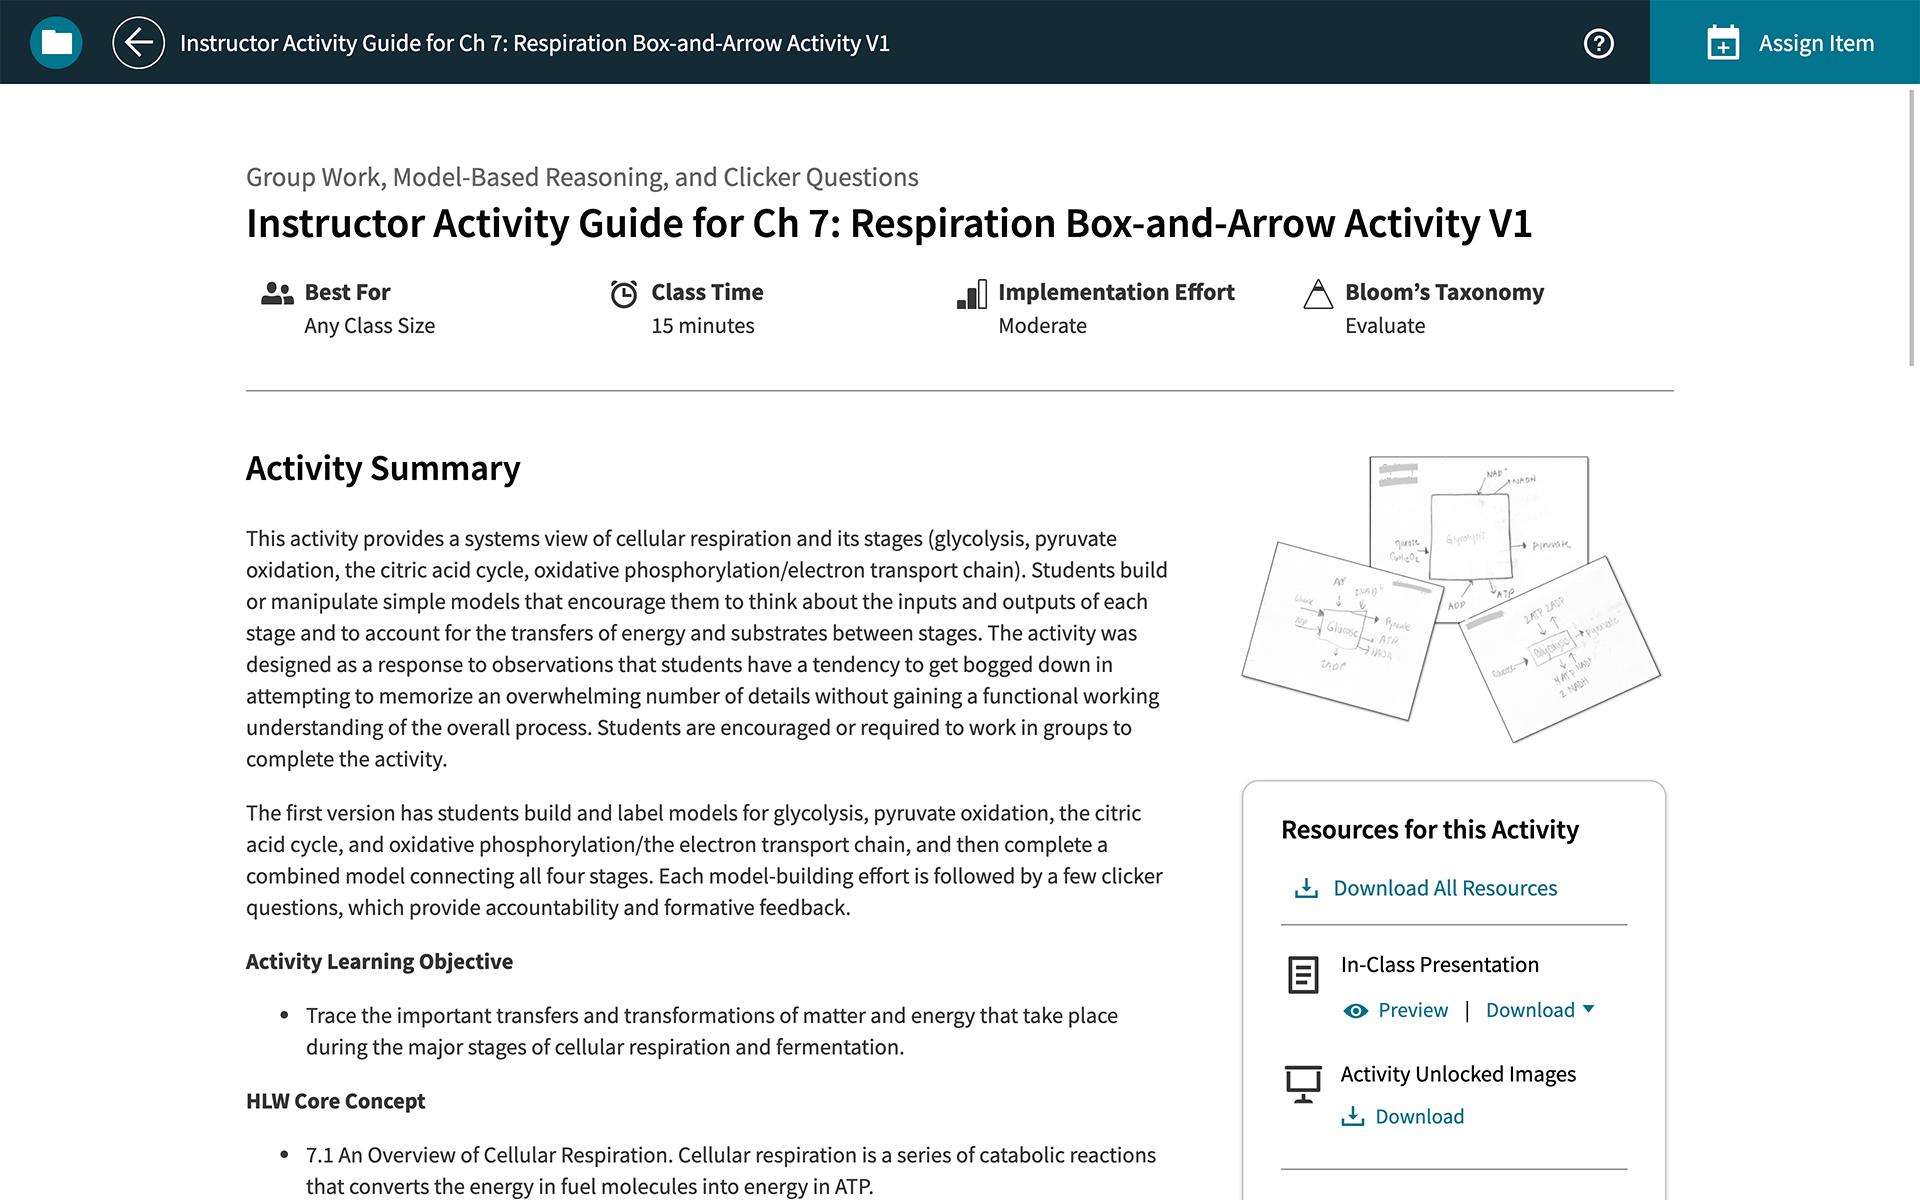 achieve activity guide